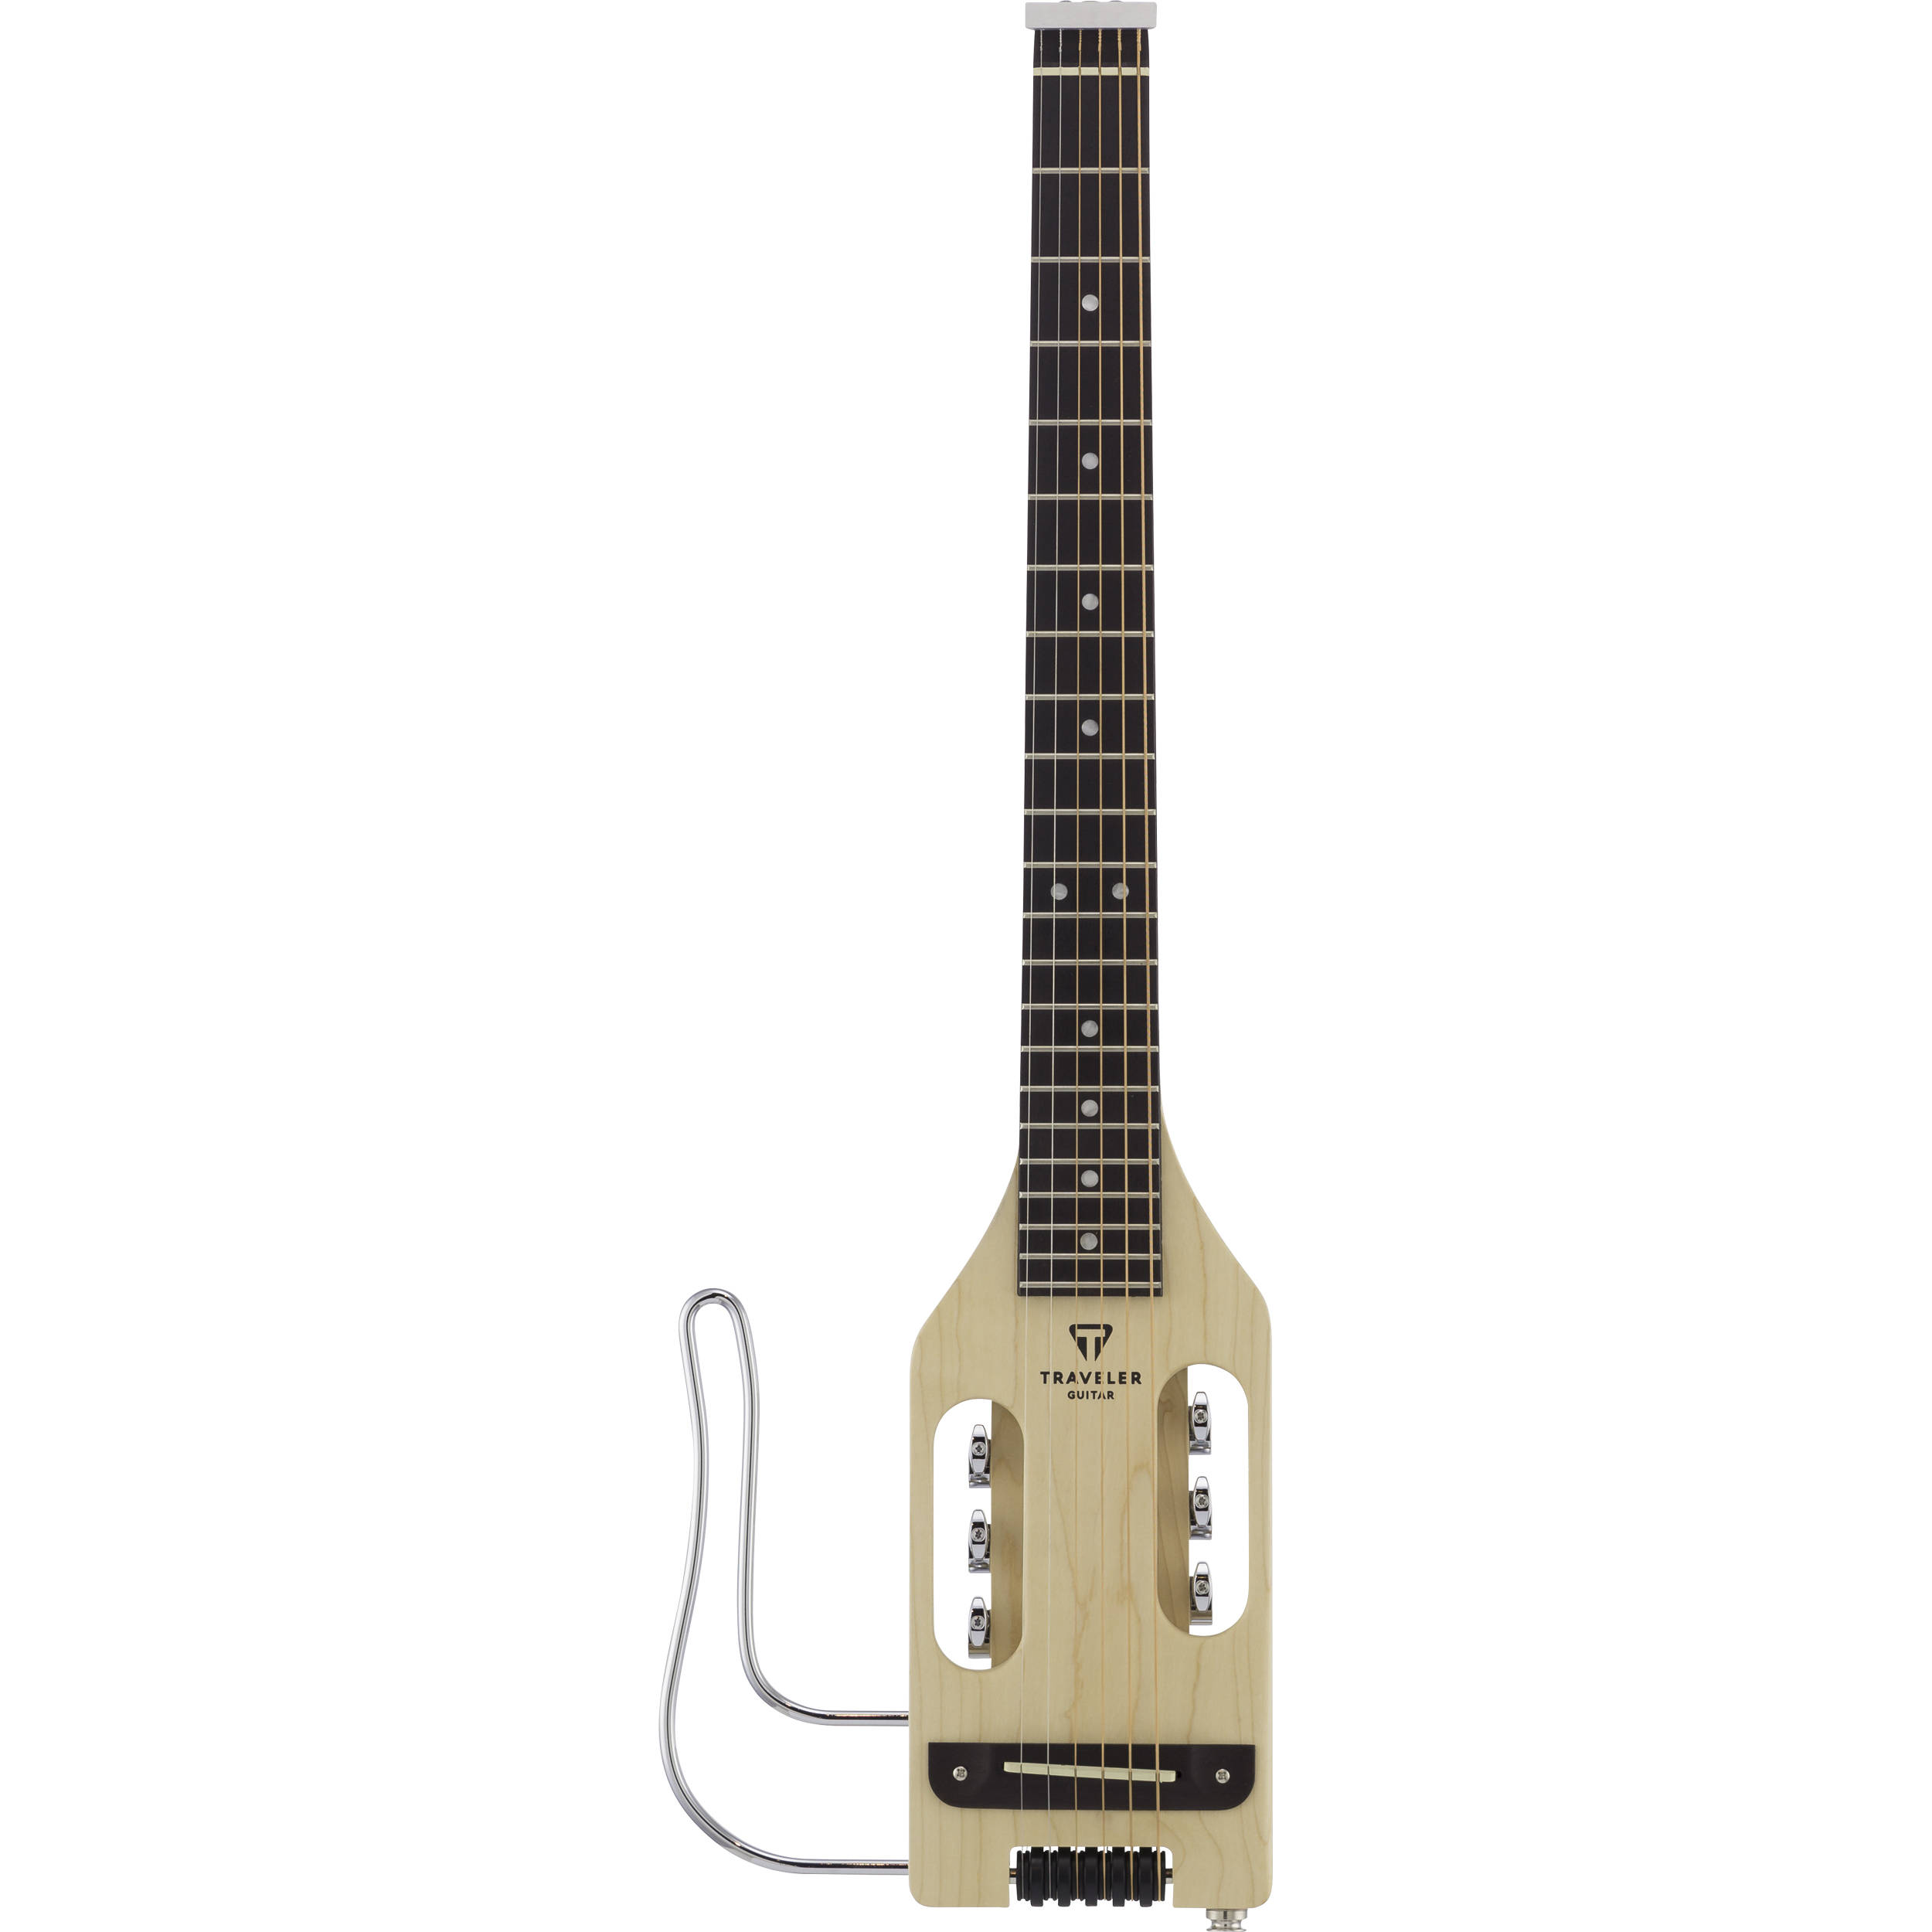 traveler guitar ultra light compact ulst nat lh b h photo. Black Bedroom Furniture Sets. Home Design Ideas